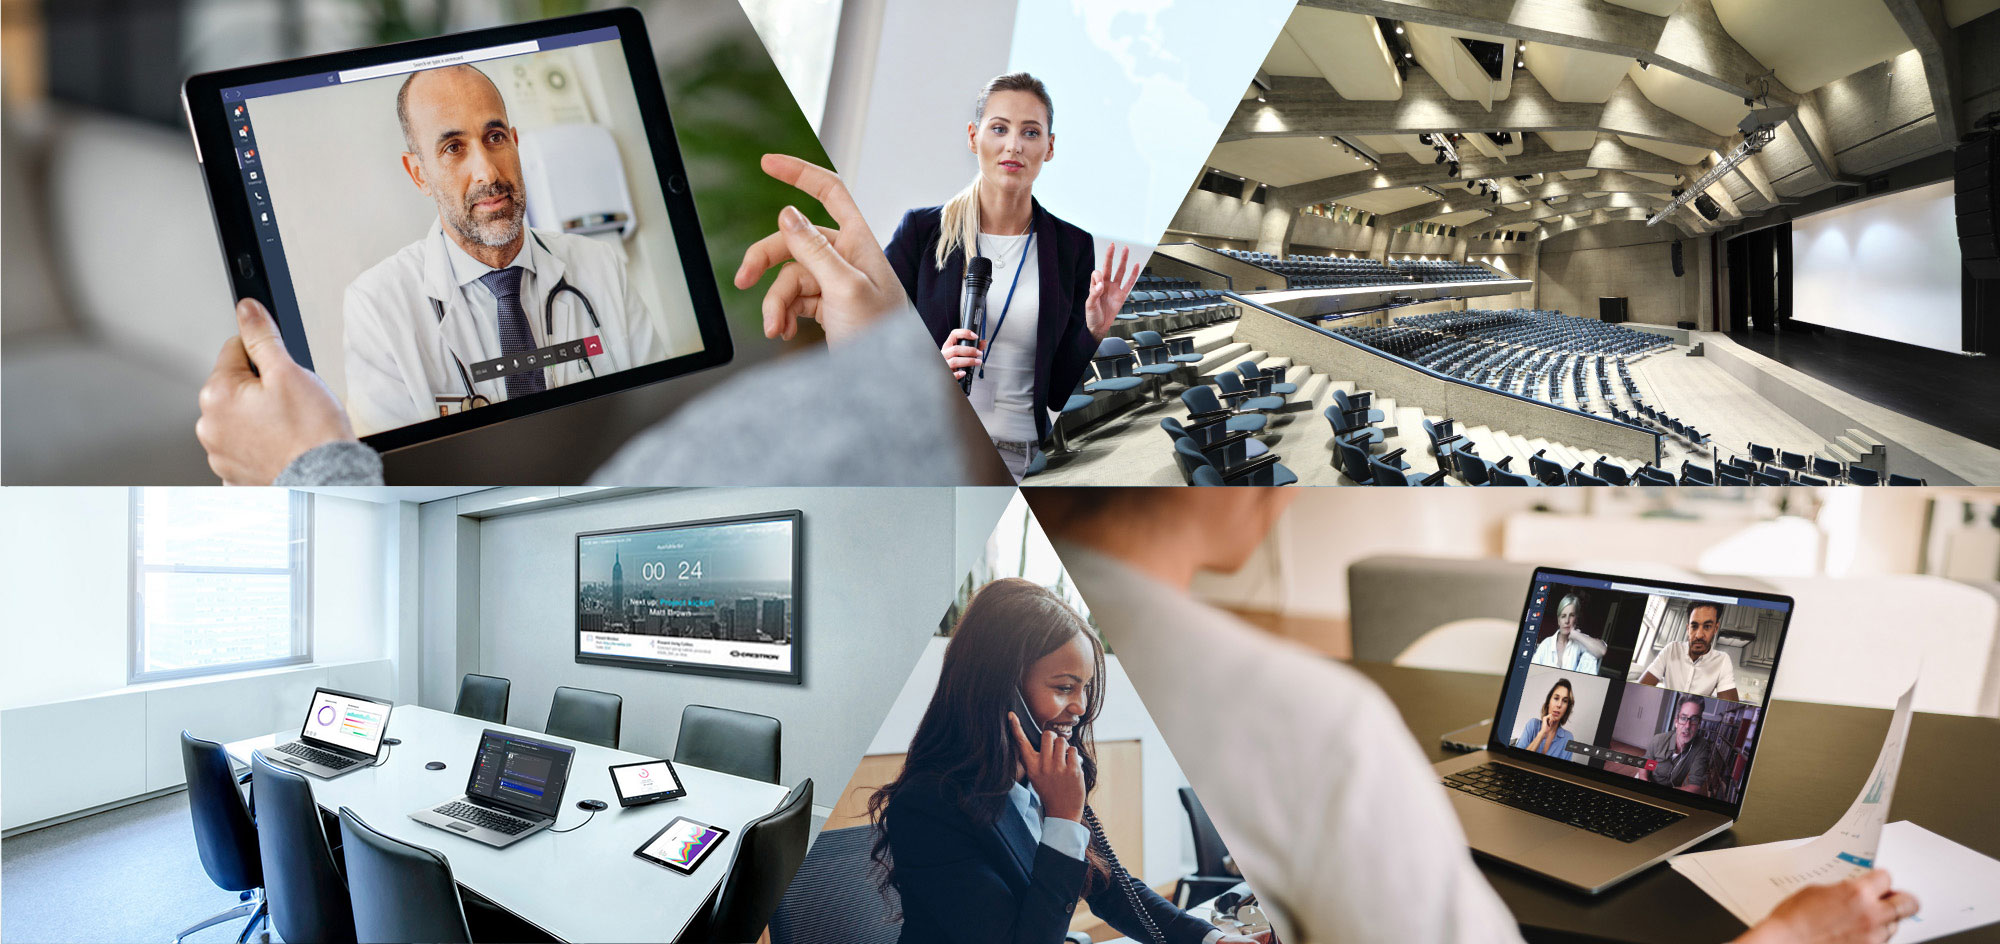 Hero image - people workin with business technologies